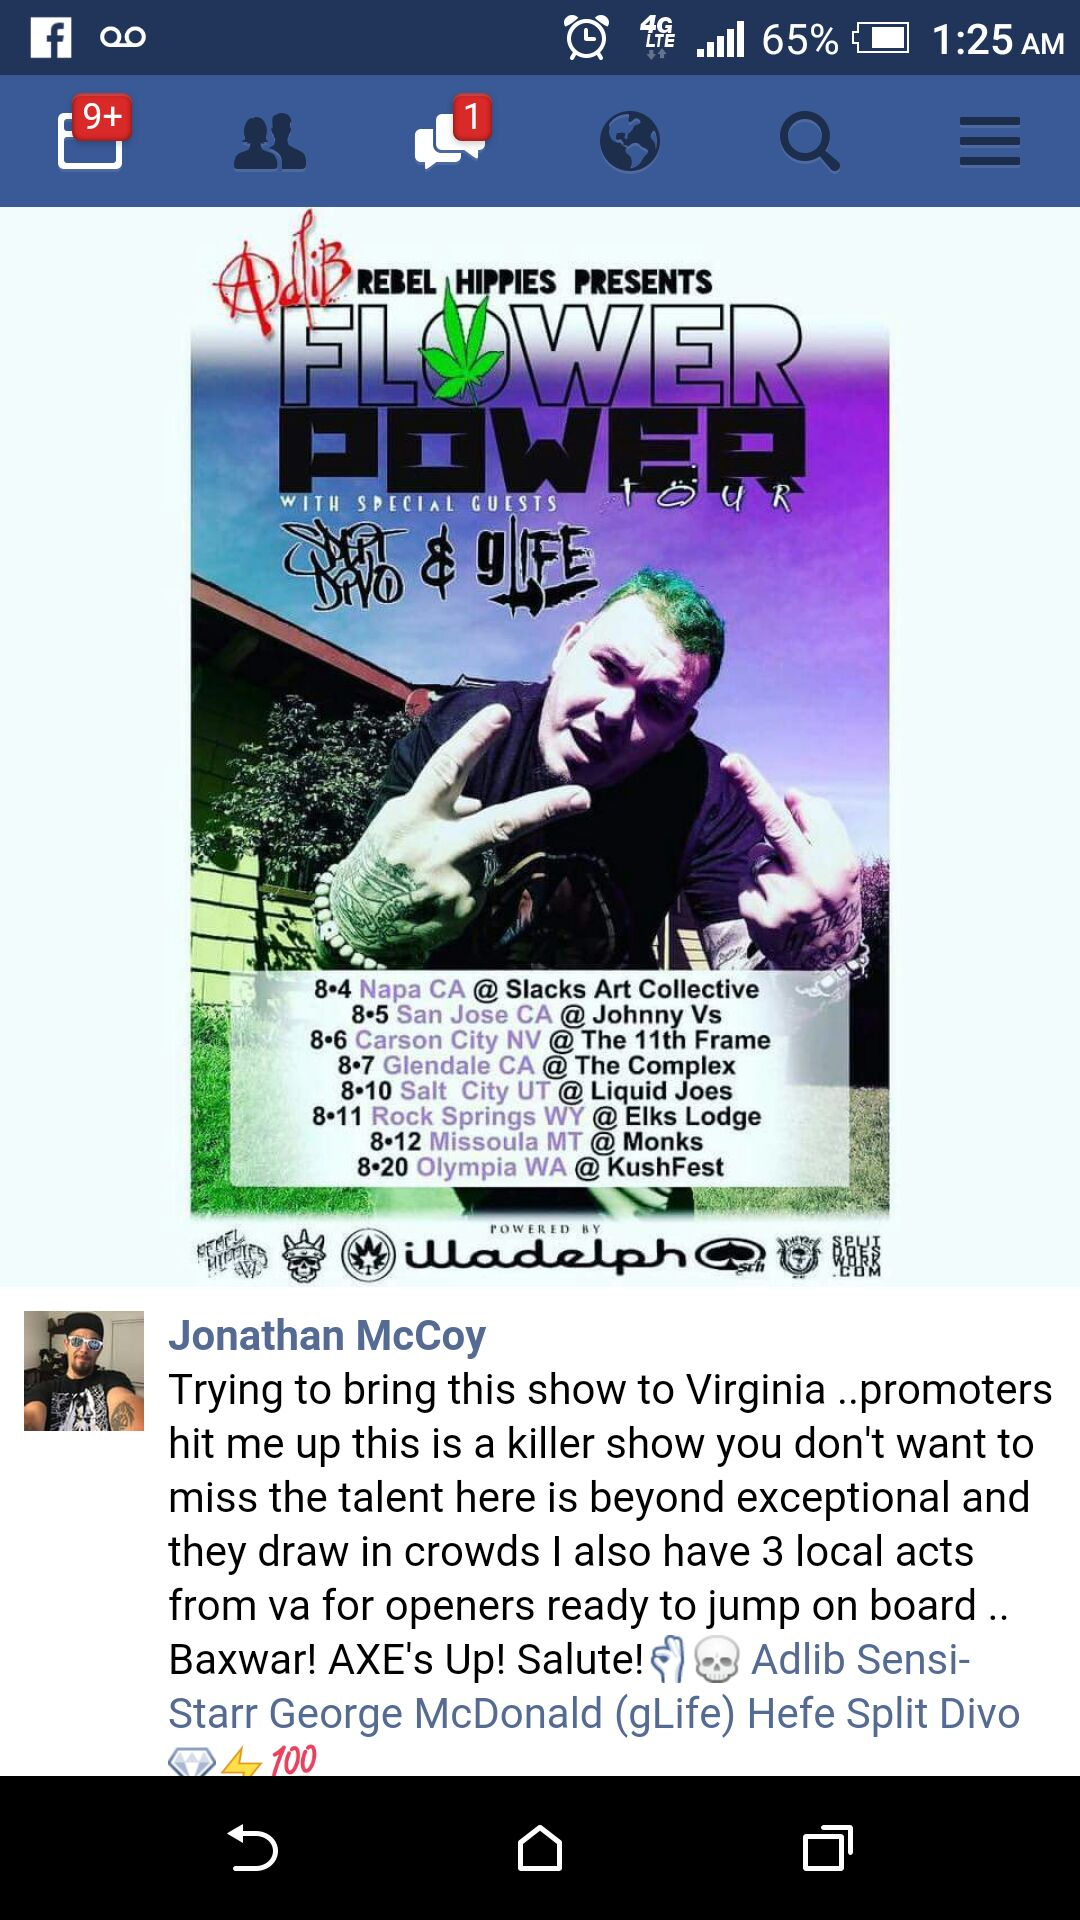 Flower Power - Adlib